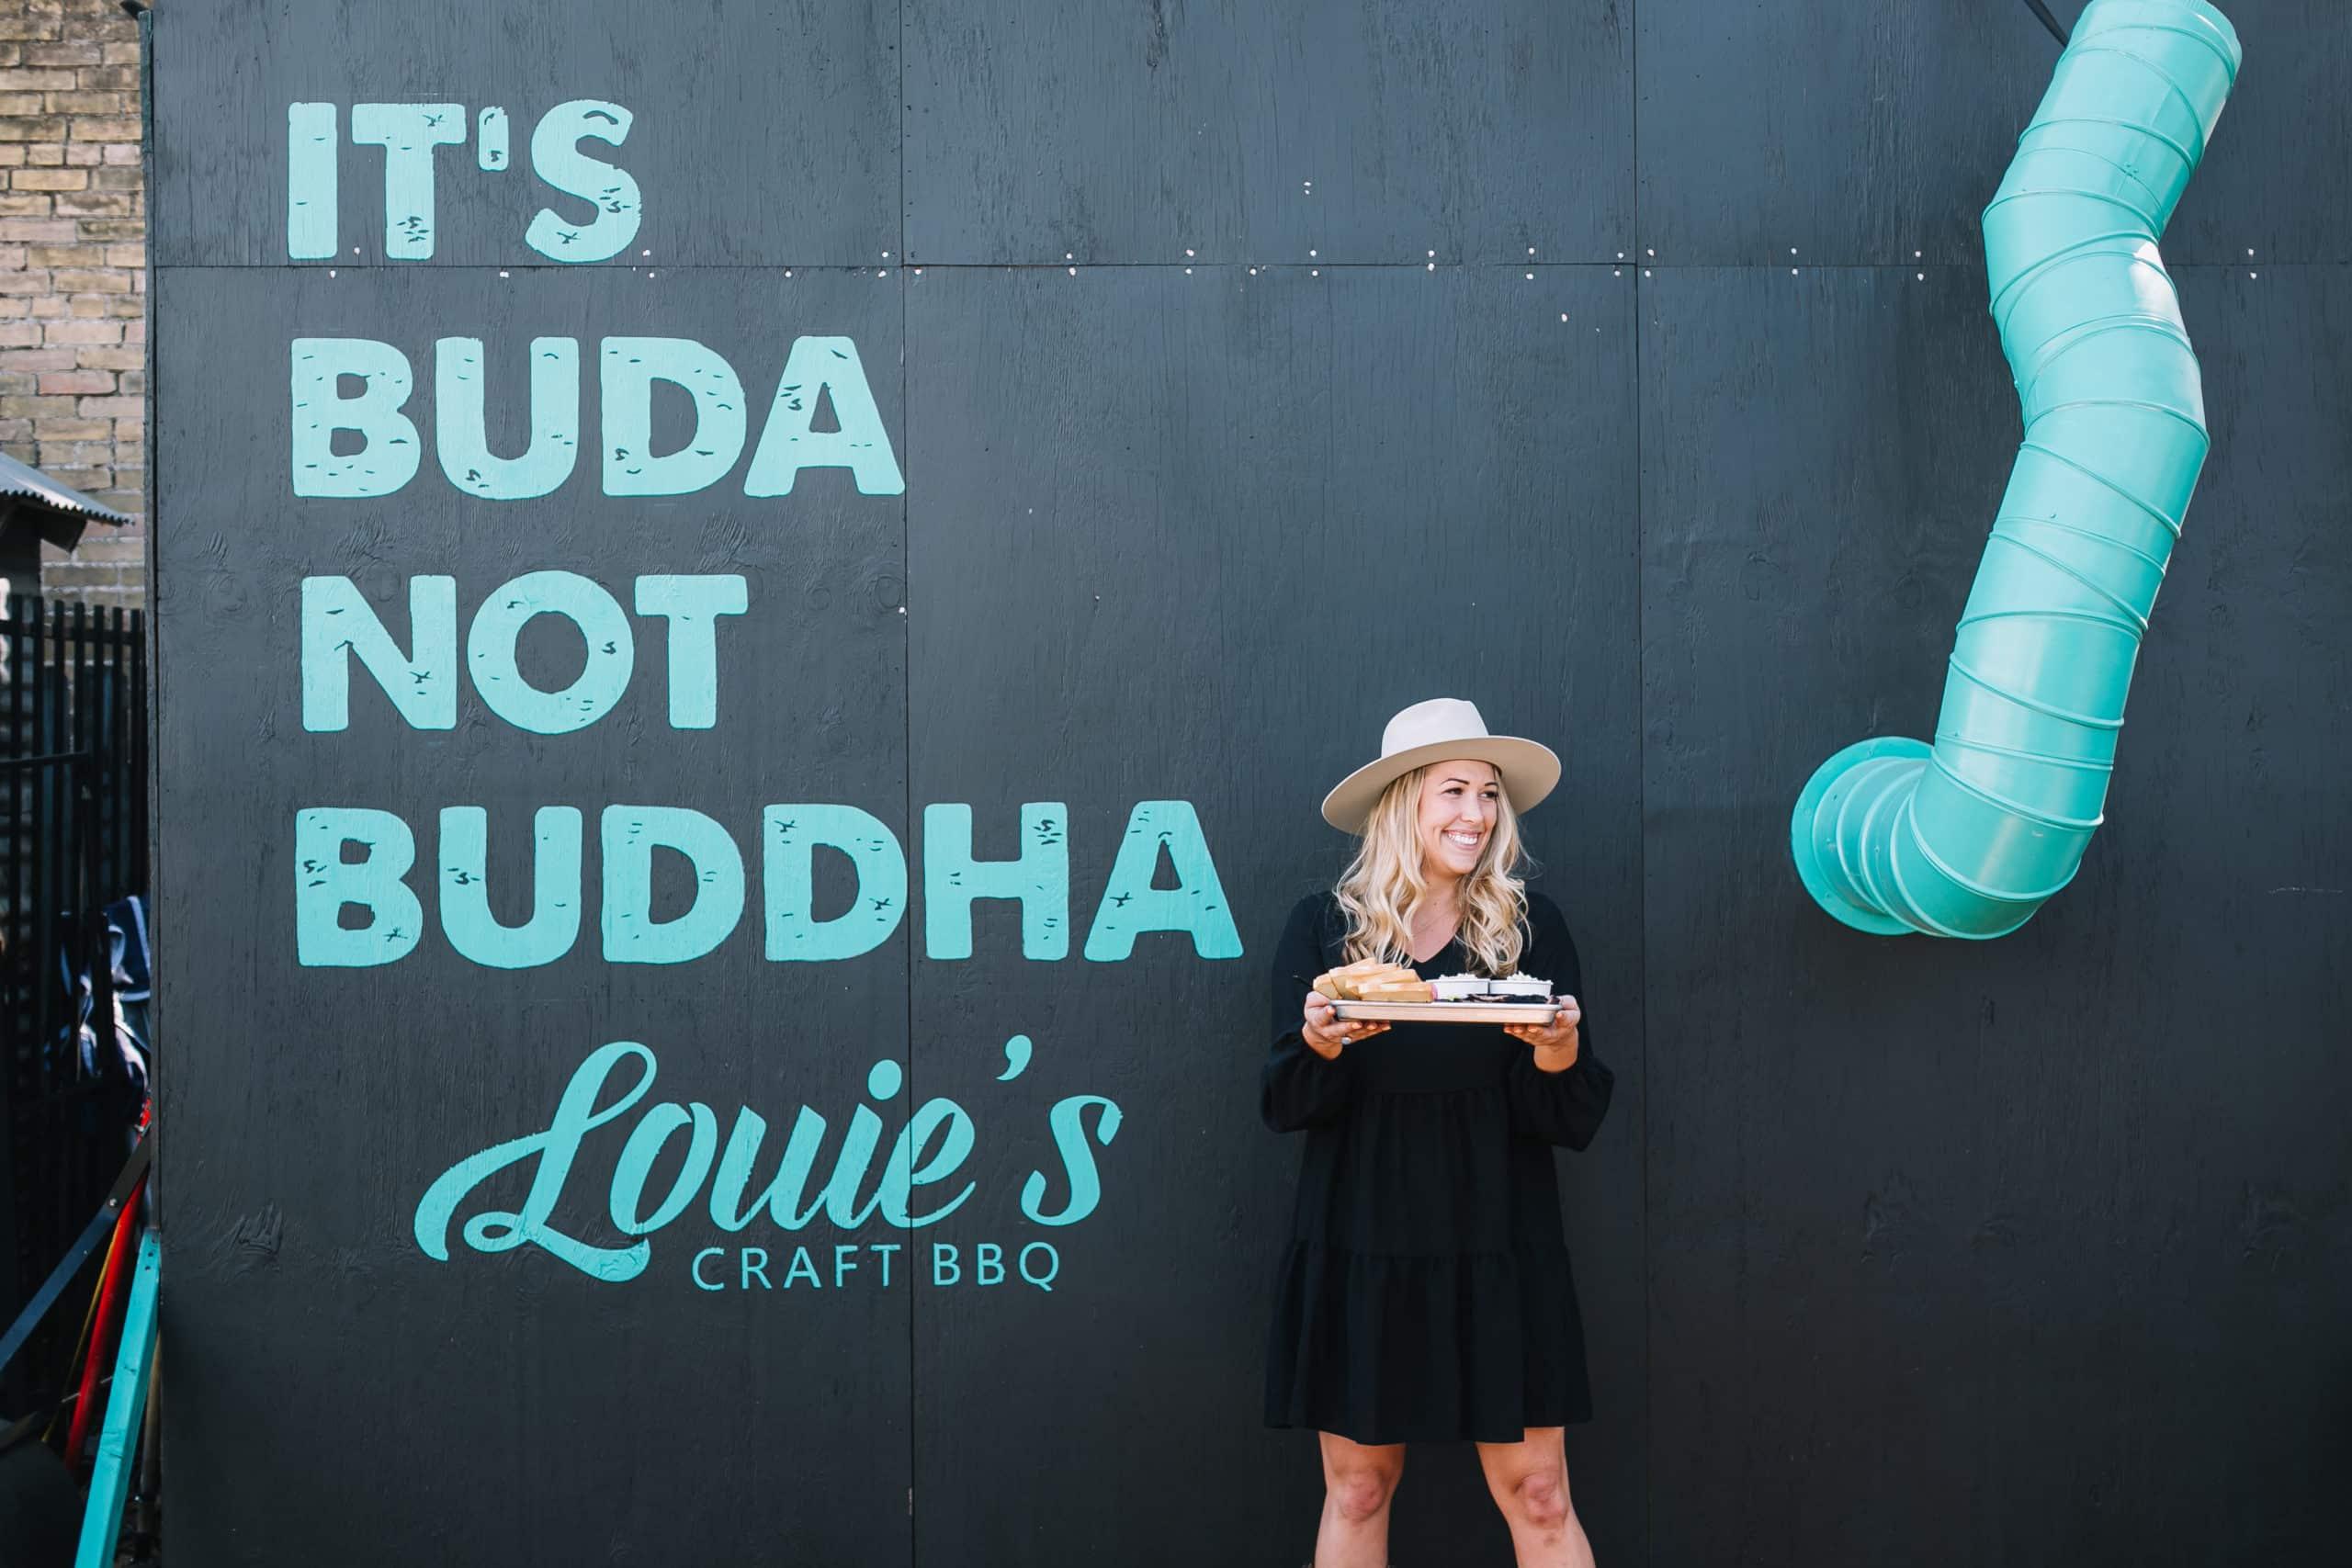 Louie's Craft BBQ | Buda, Texas